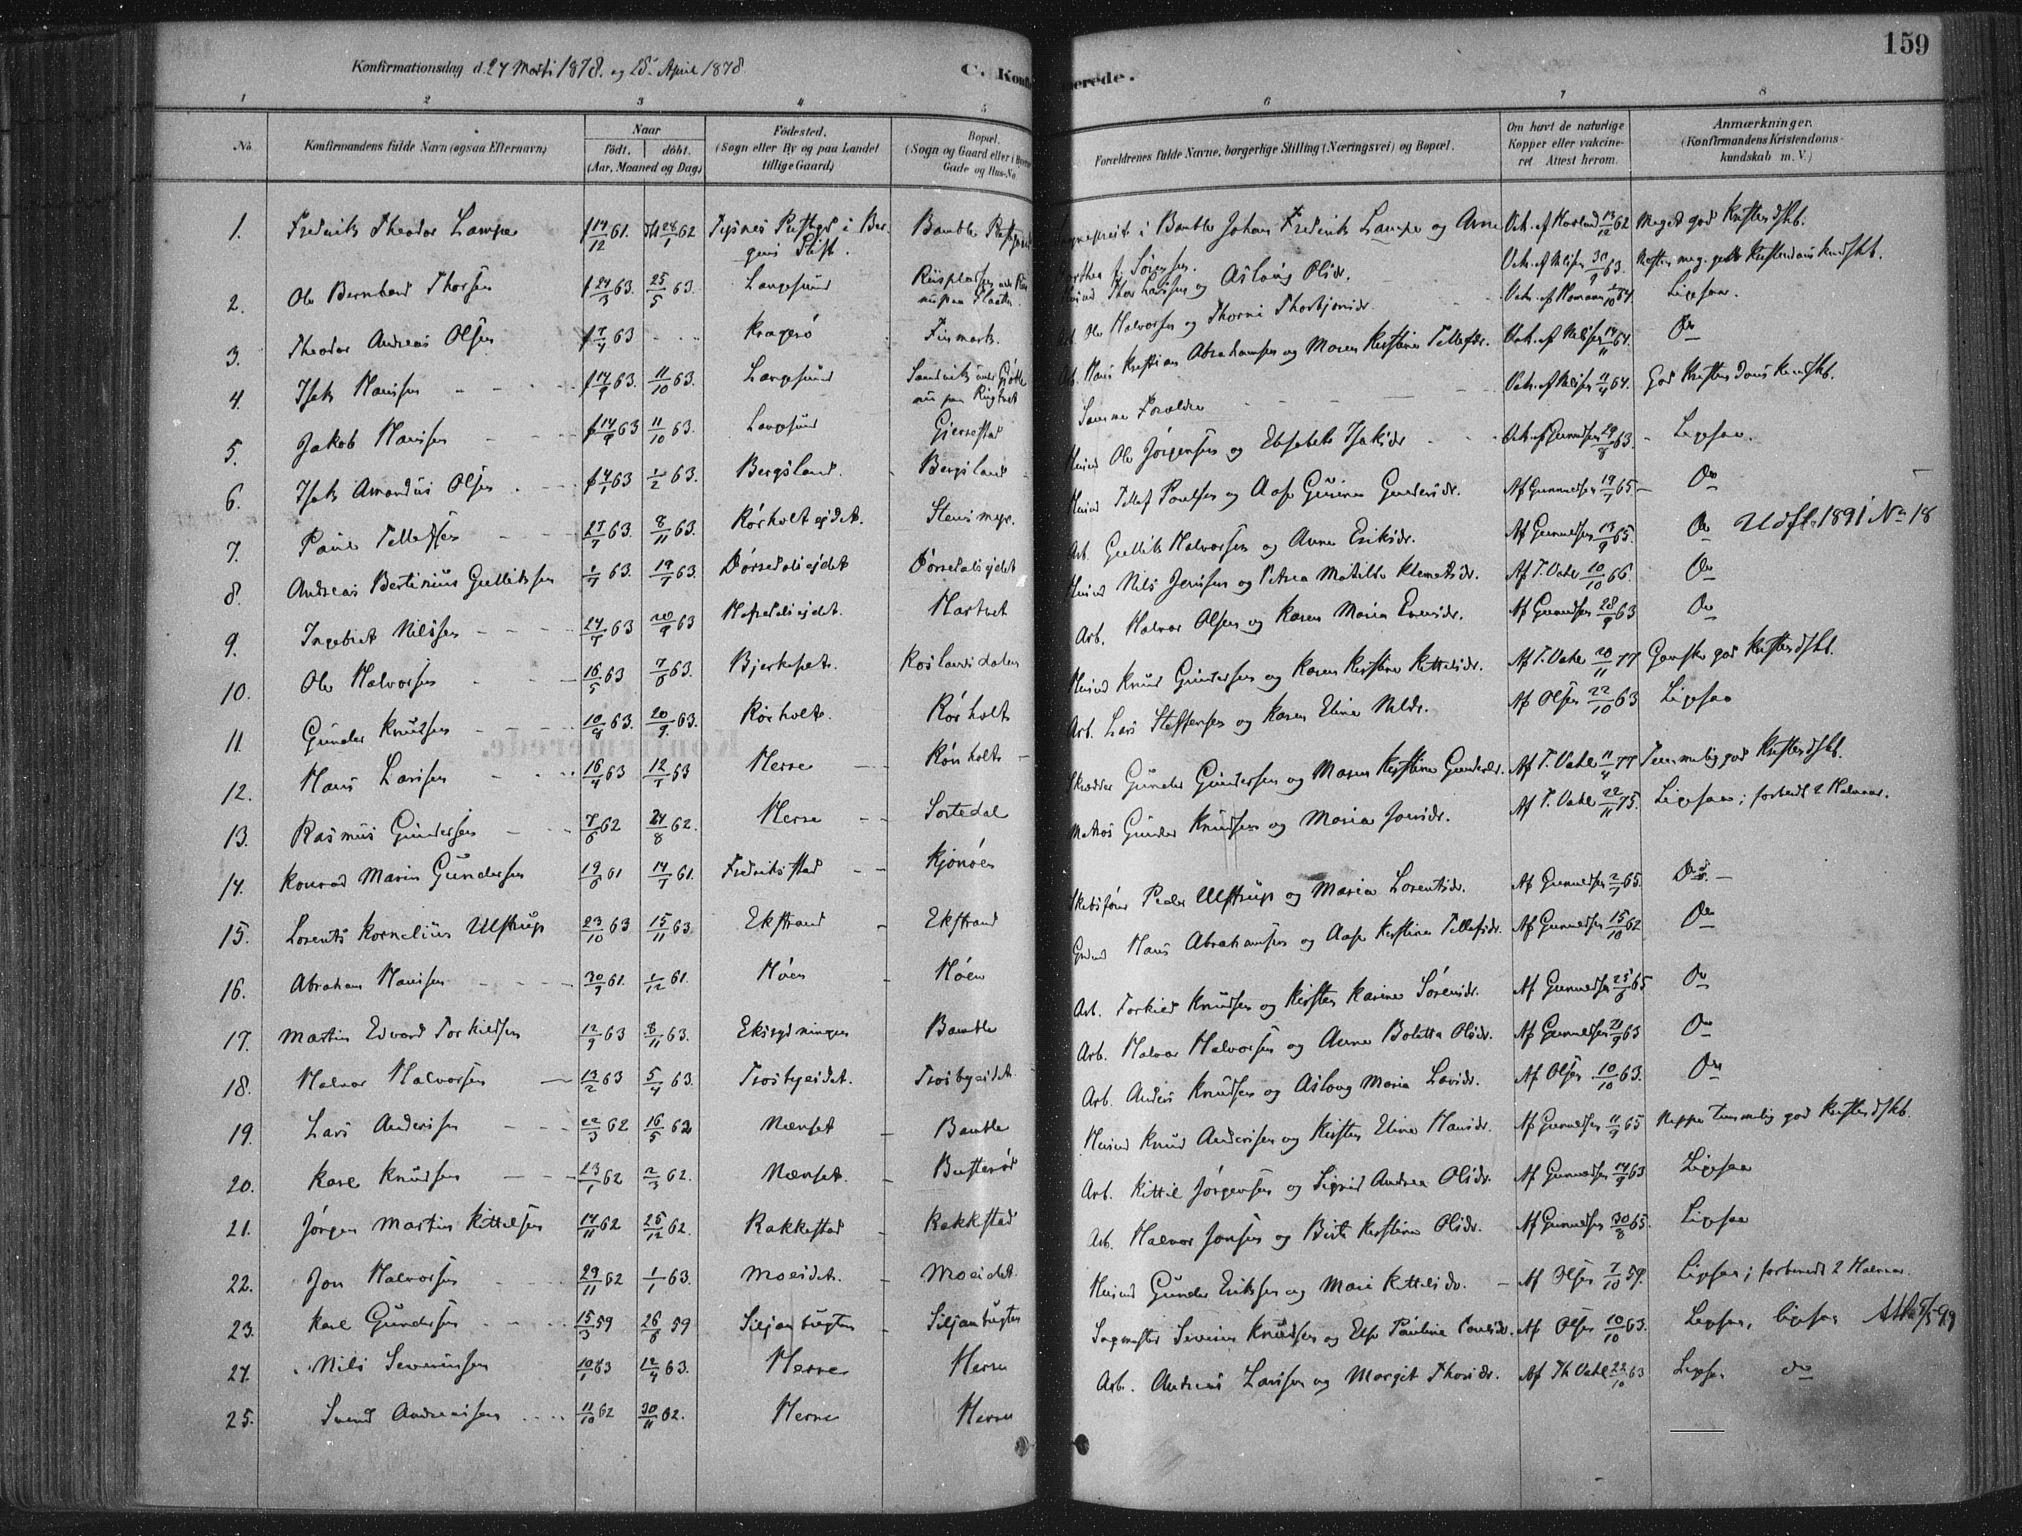 SAKO, Bamble kirkebøker, F/Fa/L0007: Ministerialbok nr. I 7, 1878-1888, s. 159